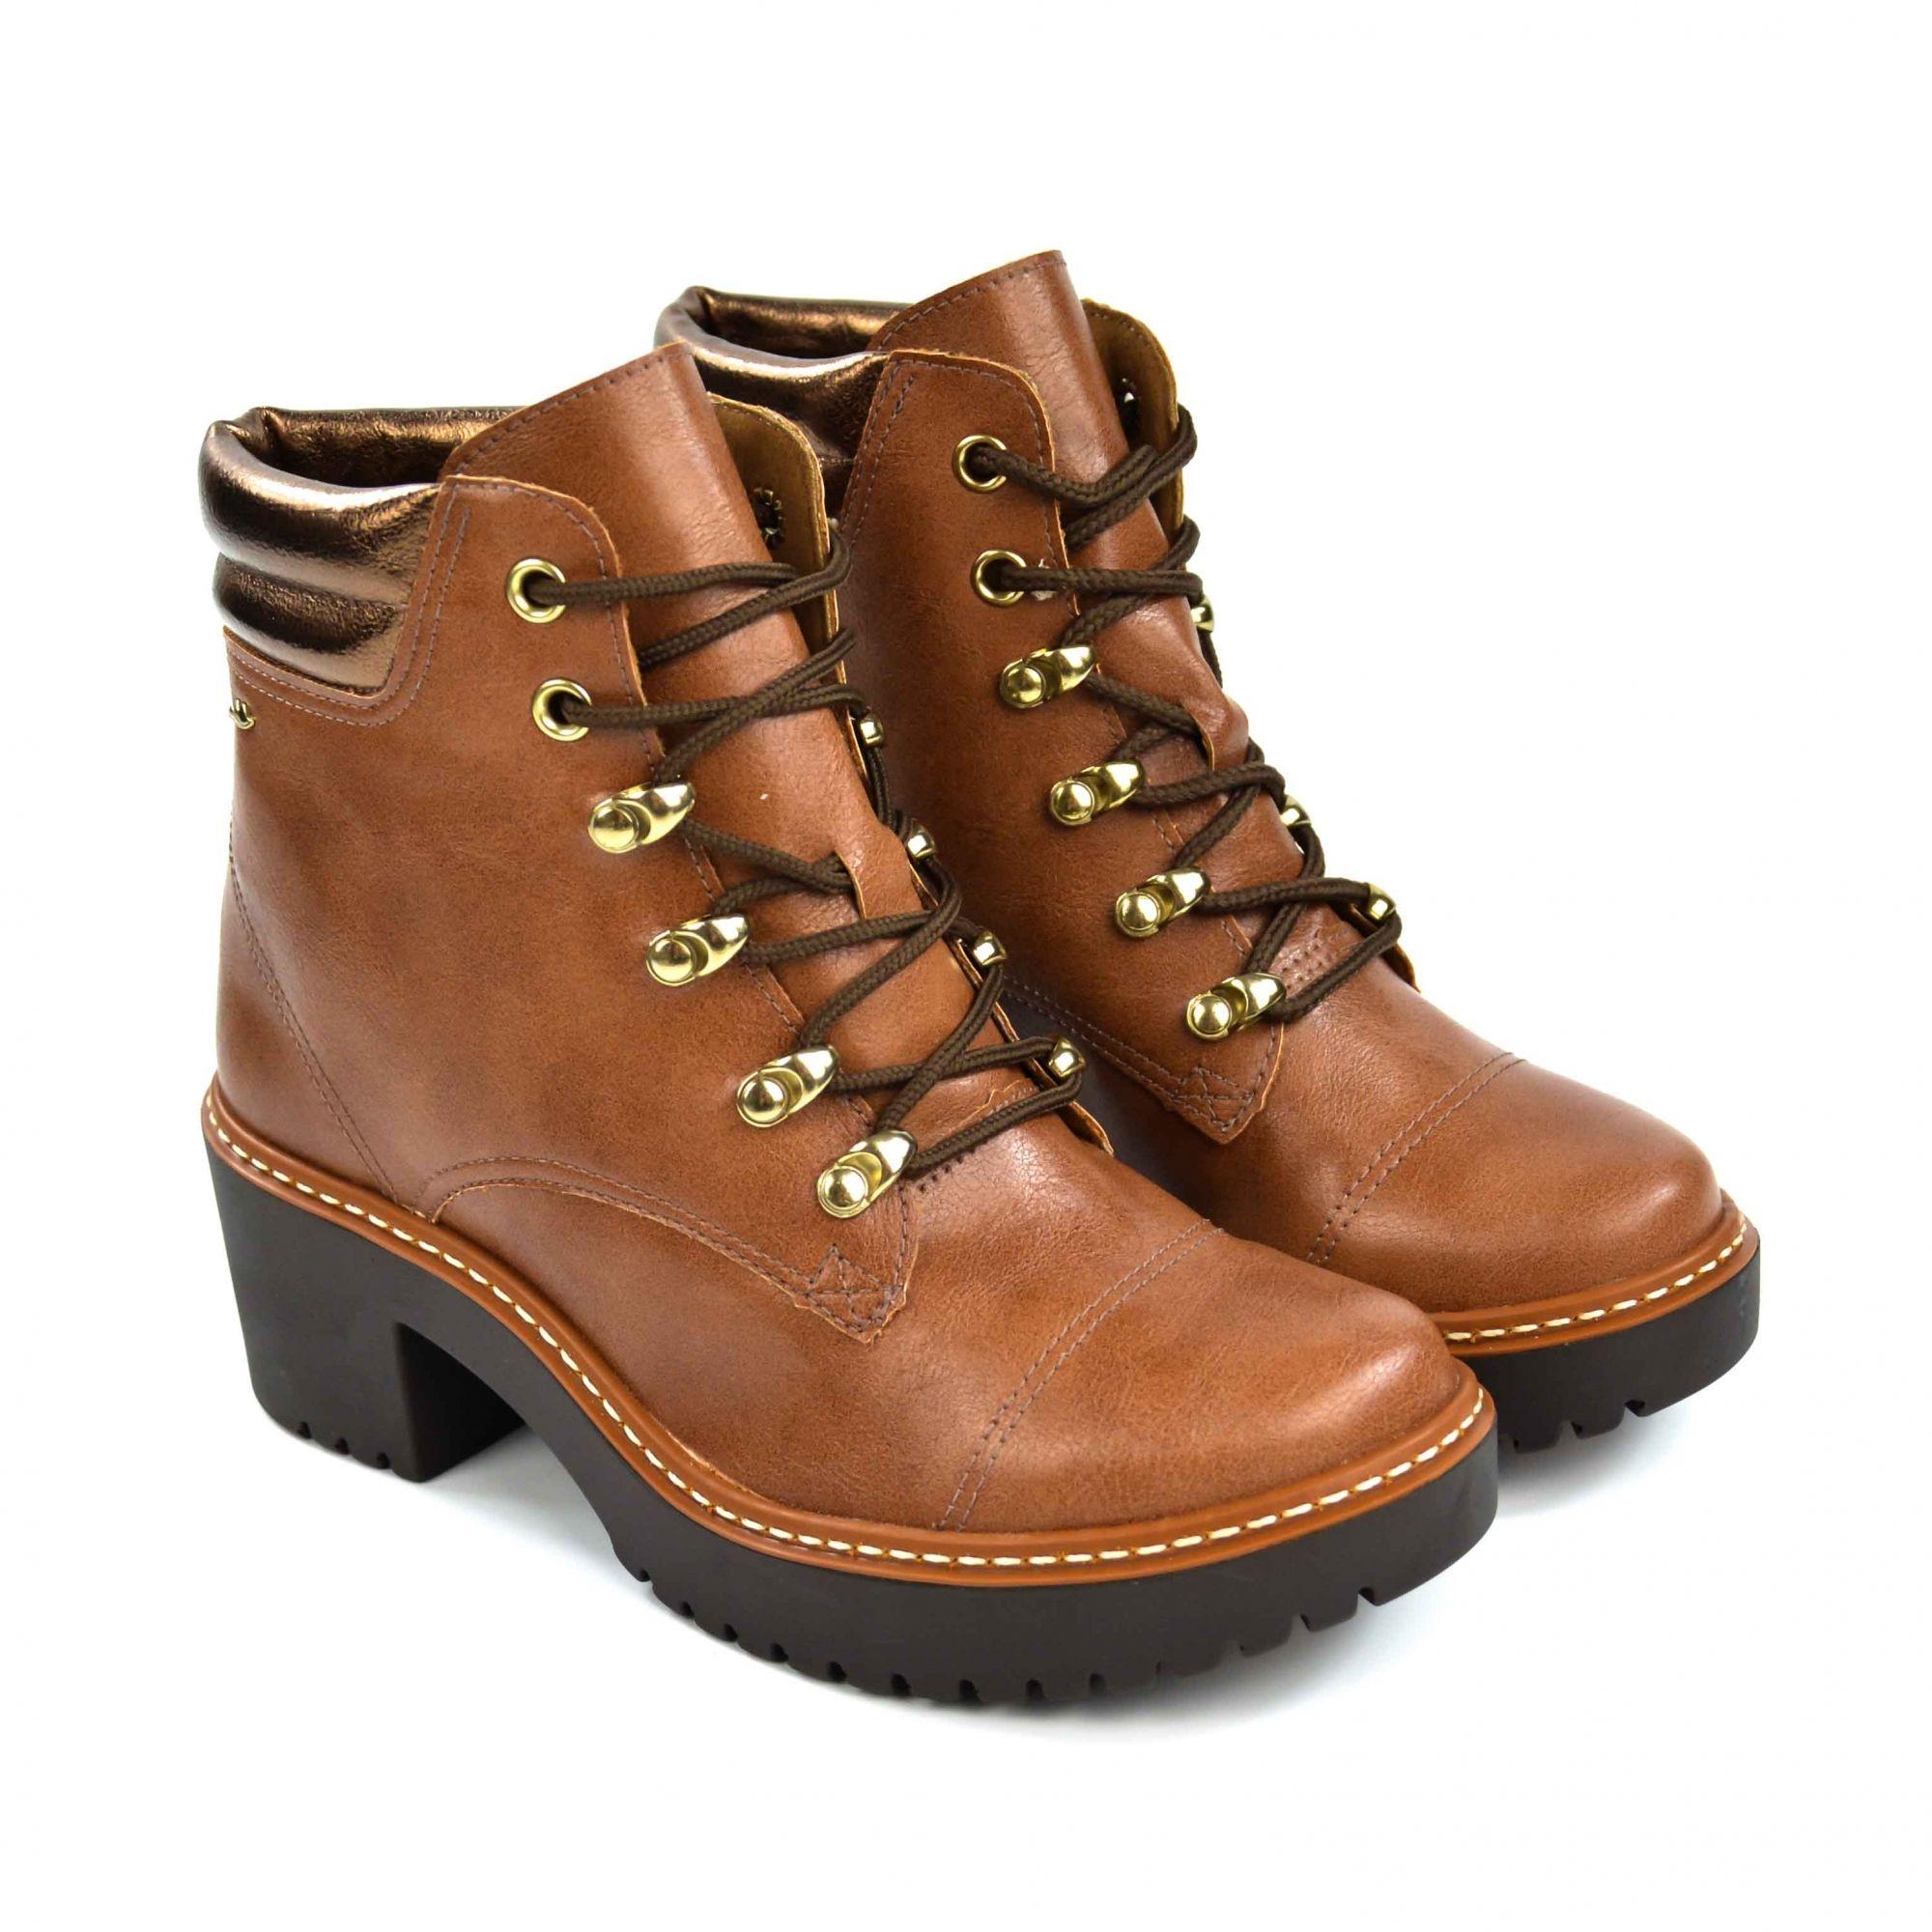 Bota tratorada canela/branze Dakota B9921 - 017538